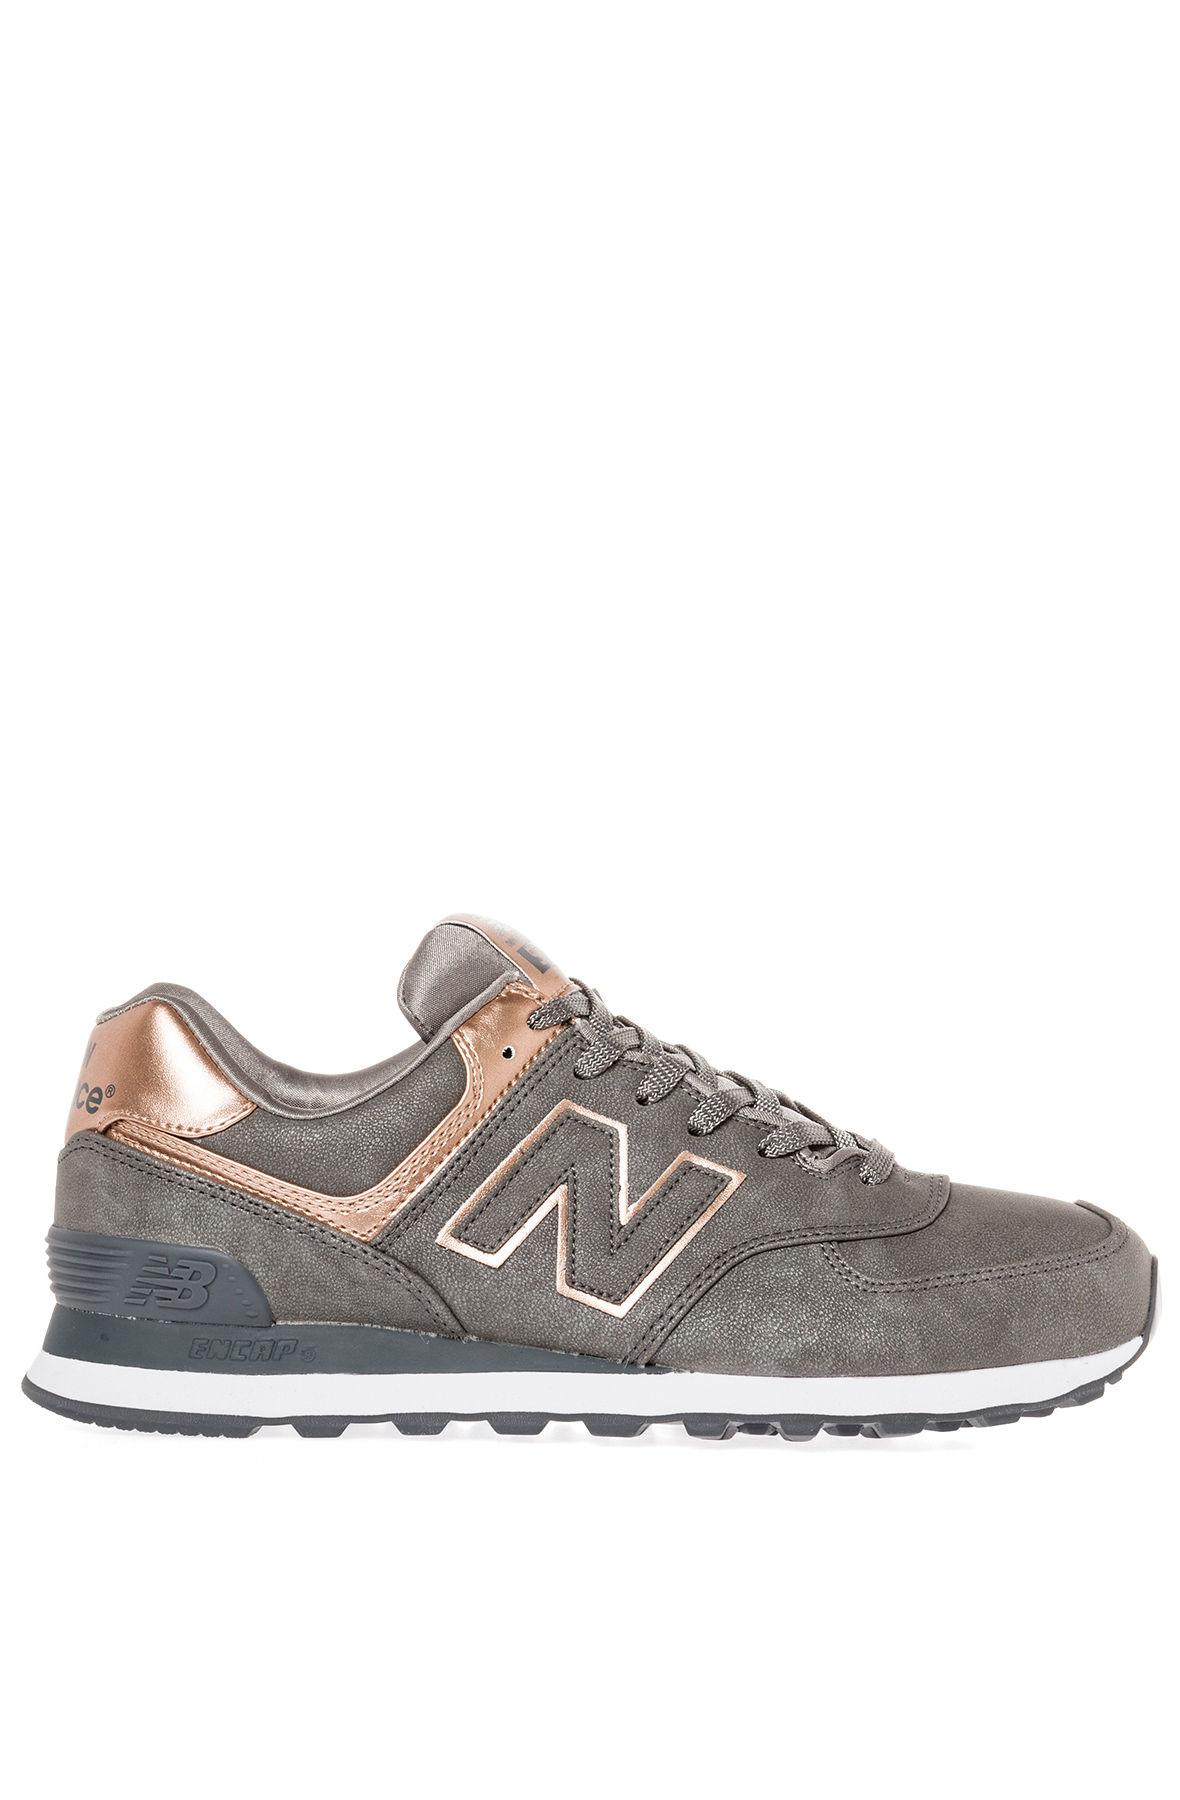 lyst new balance the precious metals 574 sneaker in metallic. Black Bedroom Furniture Sets. Home Design Ideas